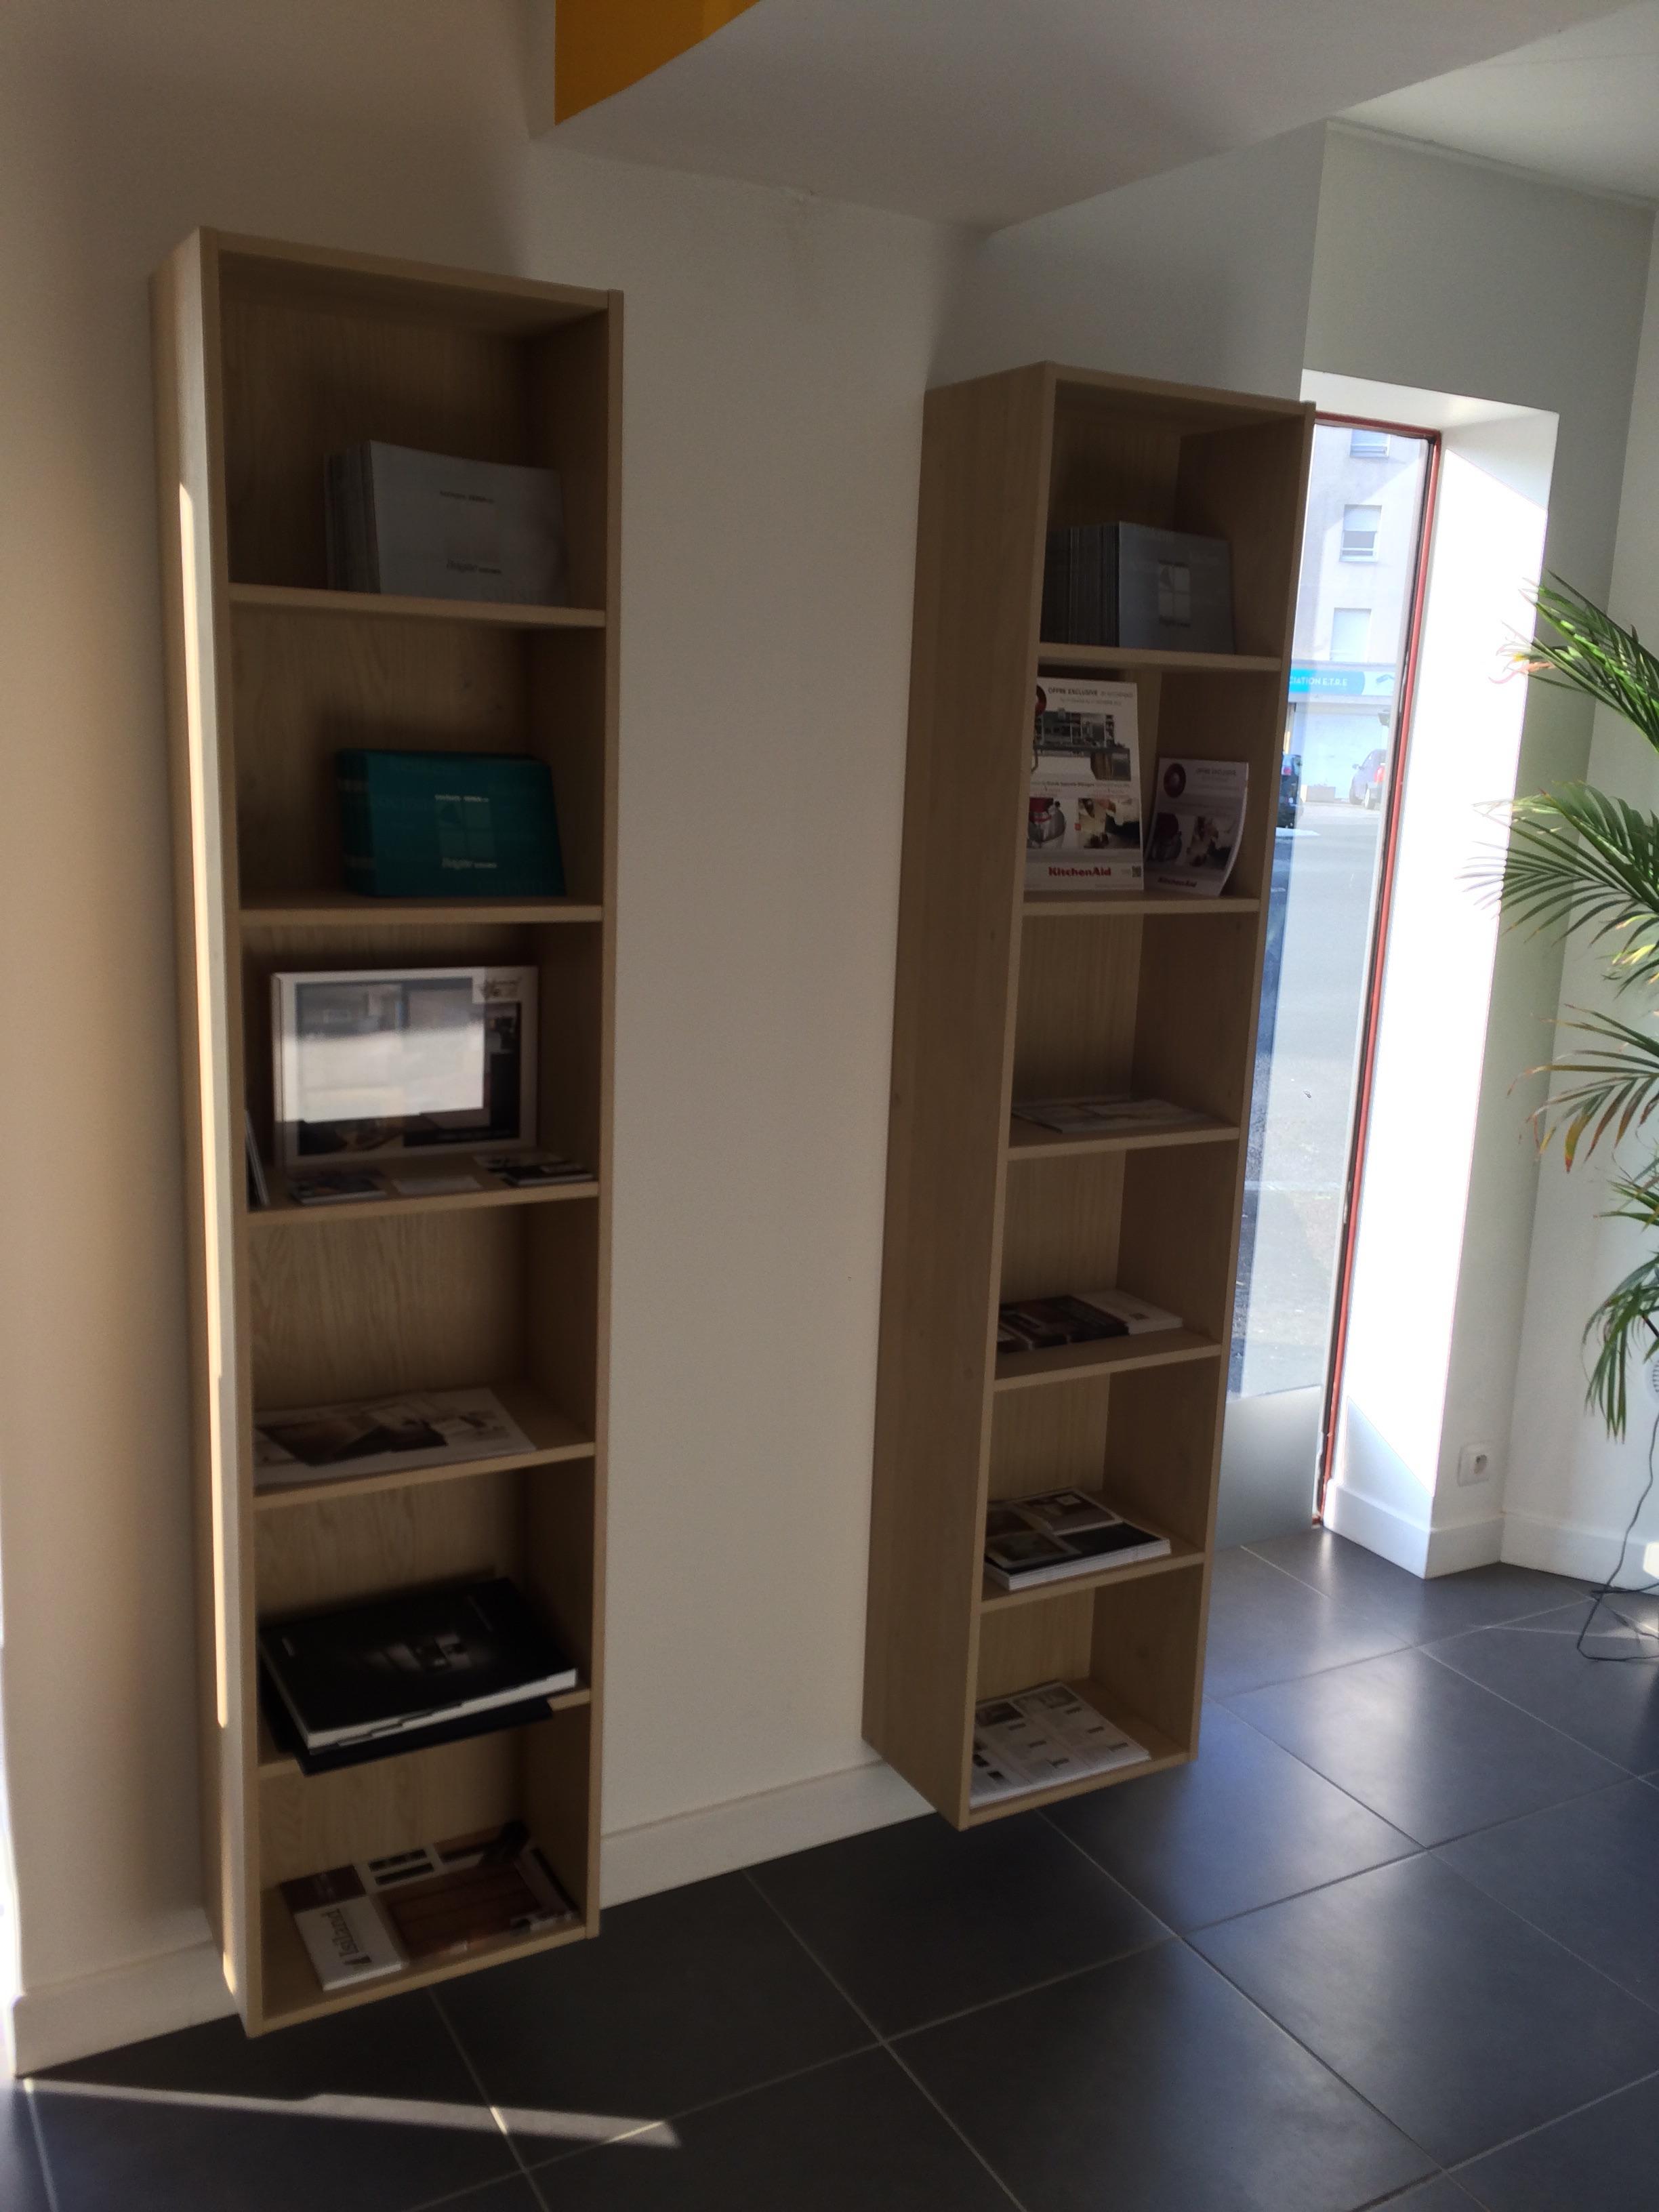 cuisine d 39 exposition en verre poli laqu gris onyx. Black Bedroom Furniture Sets. Home Design Ideas